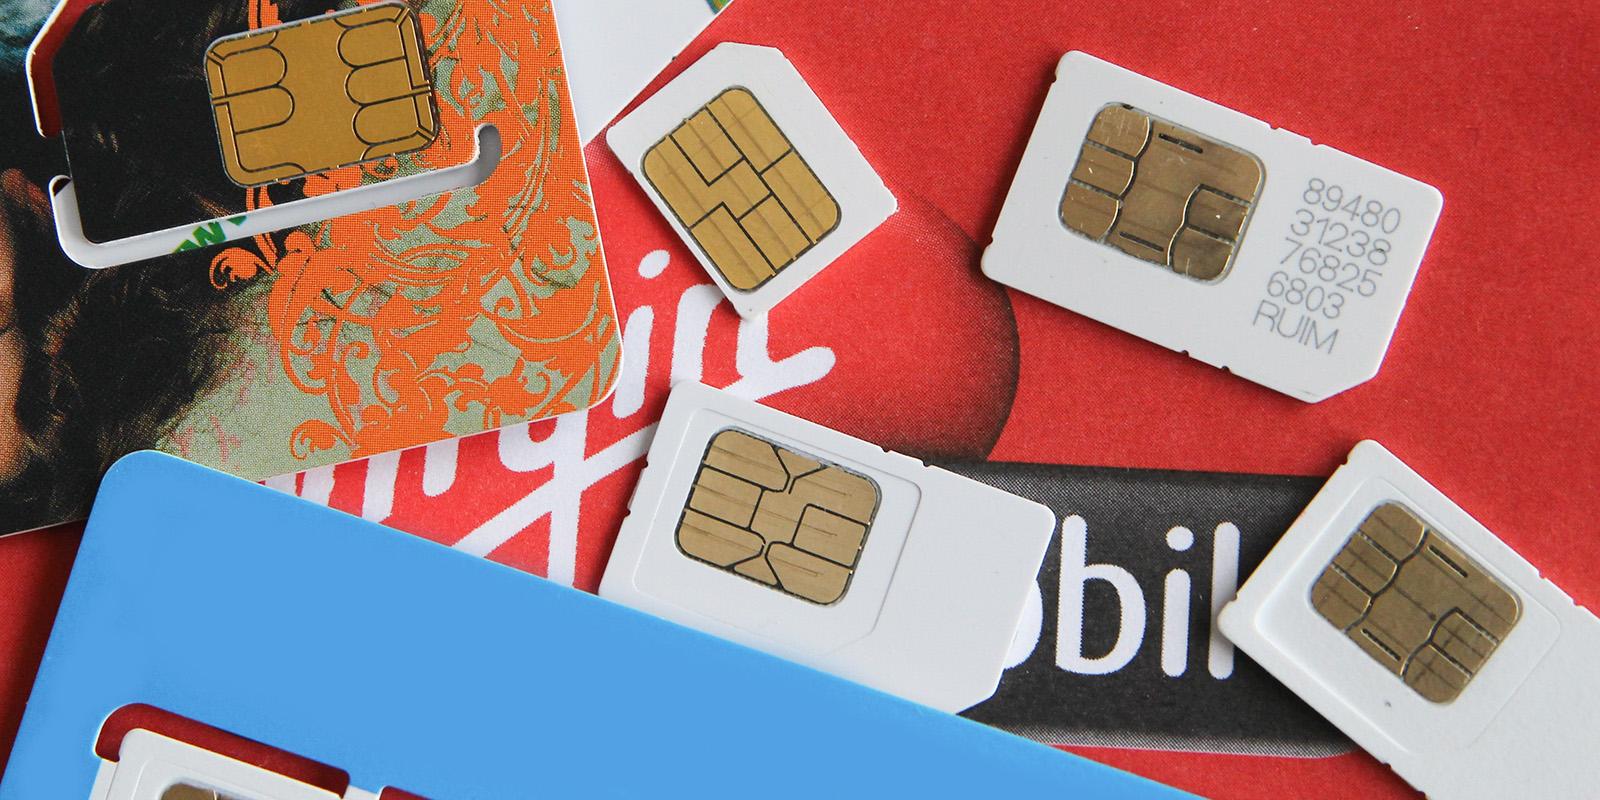 Claro kicks off 'SIM card-free' era in Brazil - BNamericas